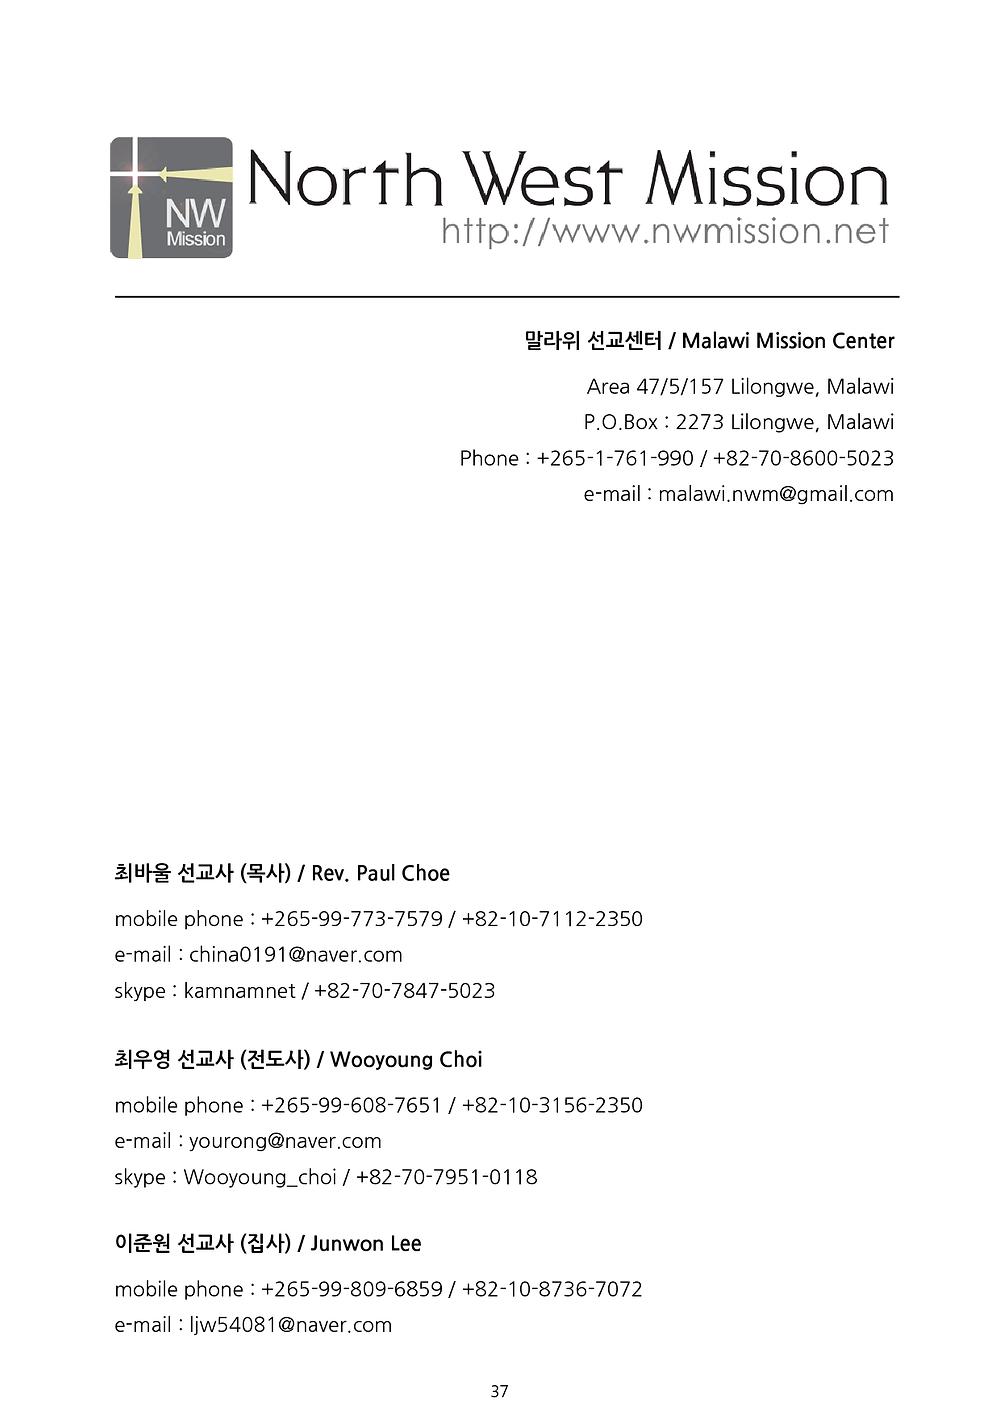 NWM 2014년 선교보고_37.png